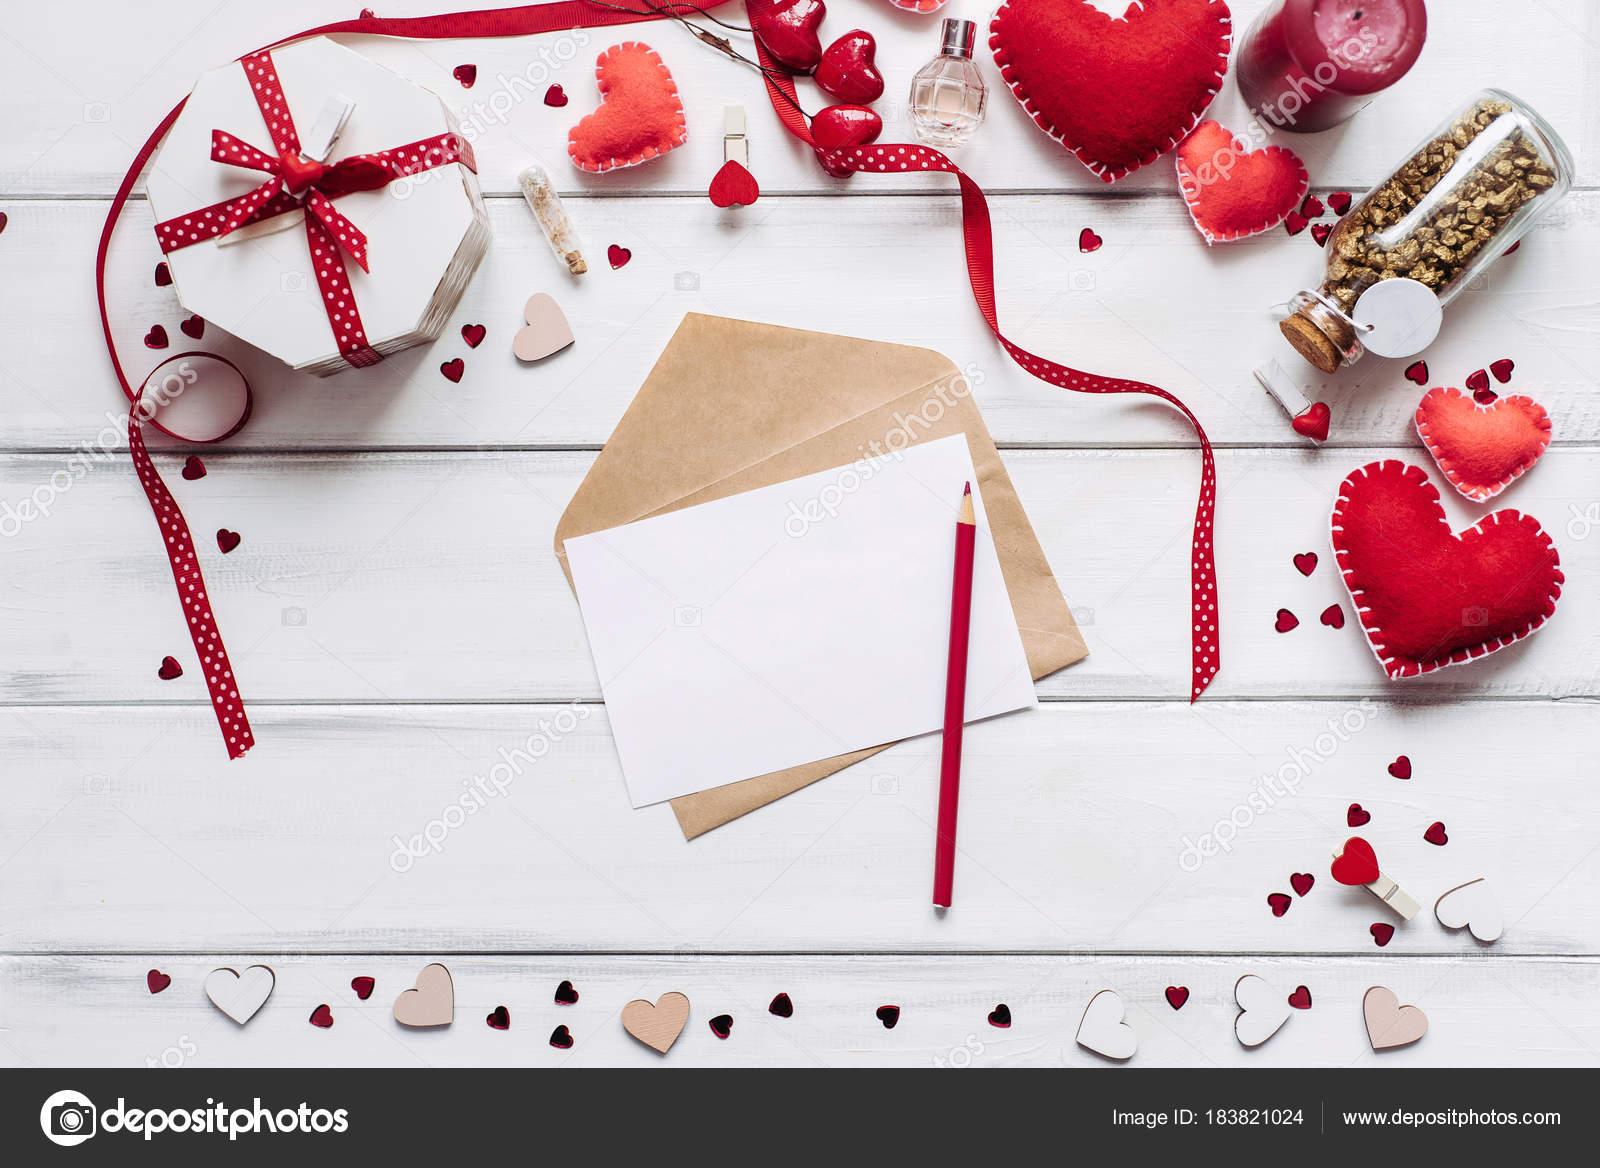 Decorative Composition Handmade Hearts Piece Paper Bottle